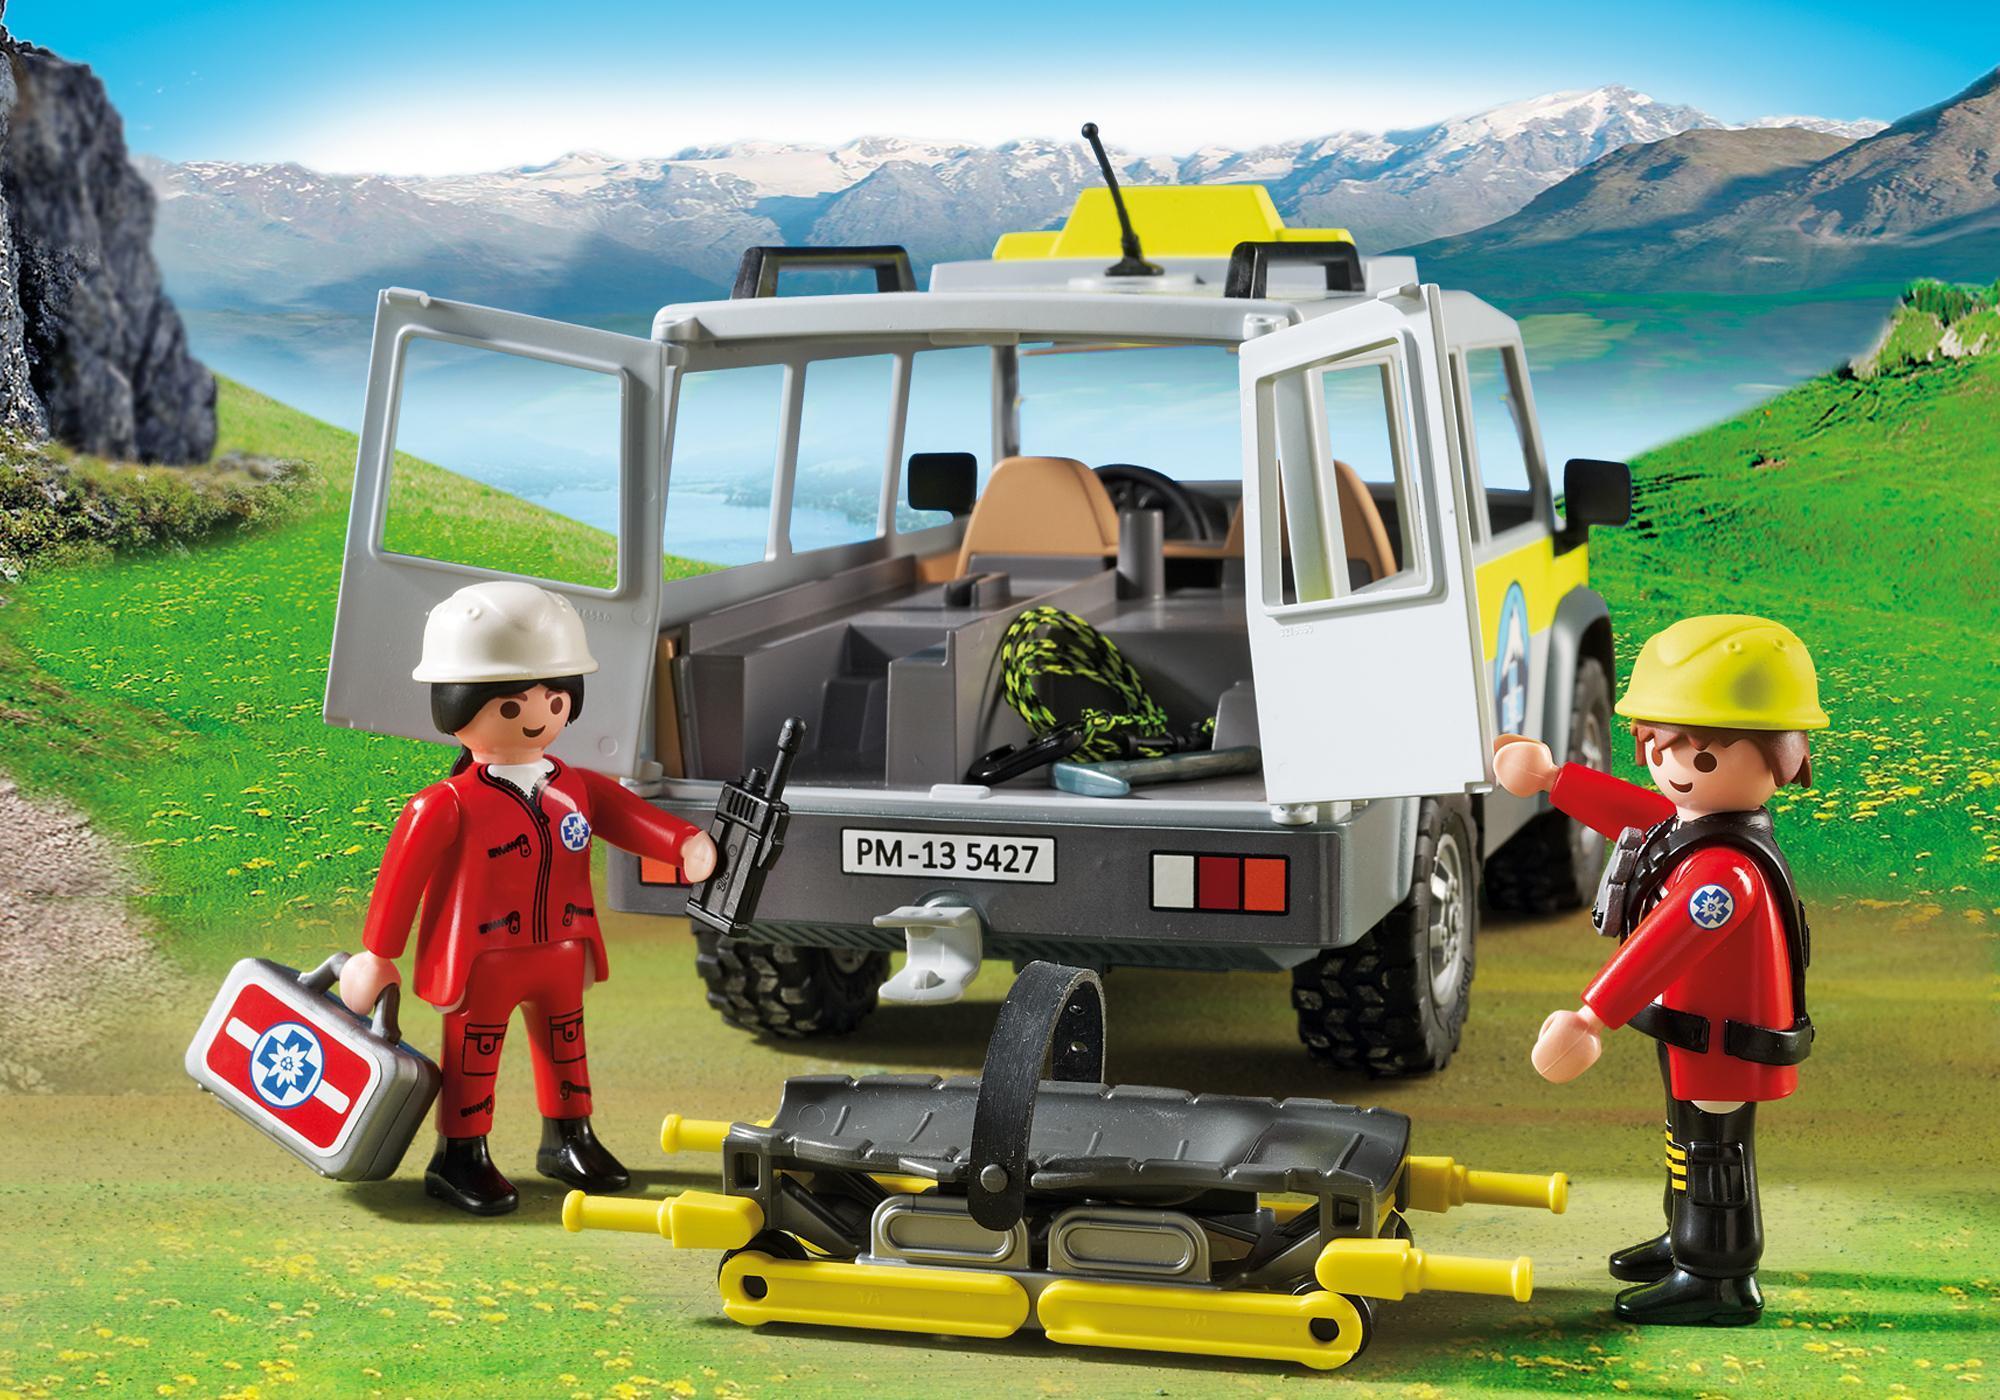 http://media.playmobil.com/i/playmobil/5427_product_extra1